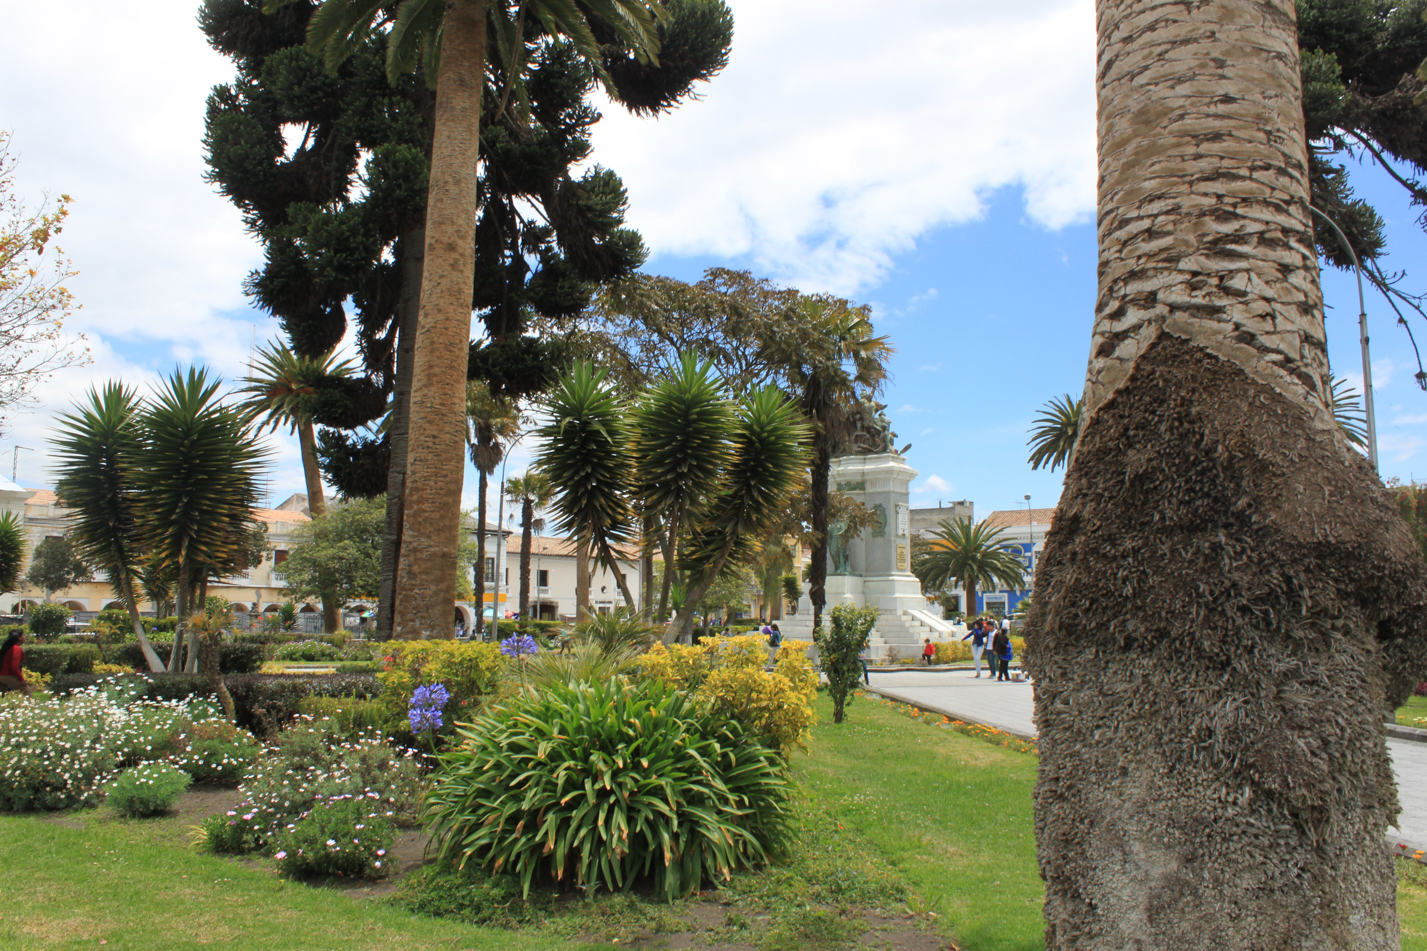 Blick über den Hauptplatz von Latacunga.